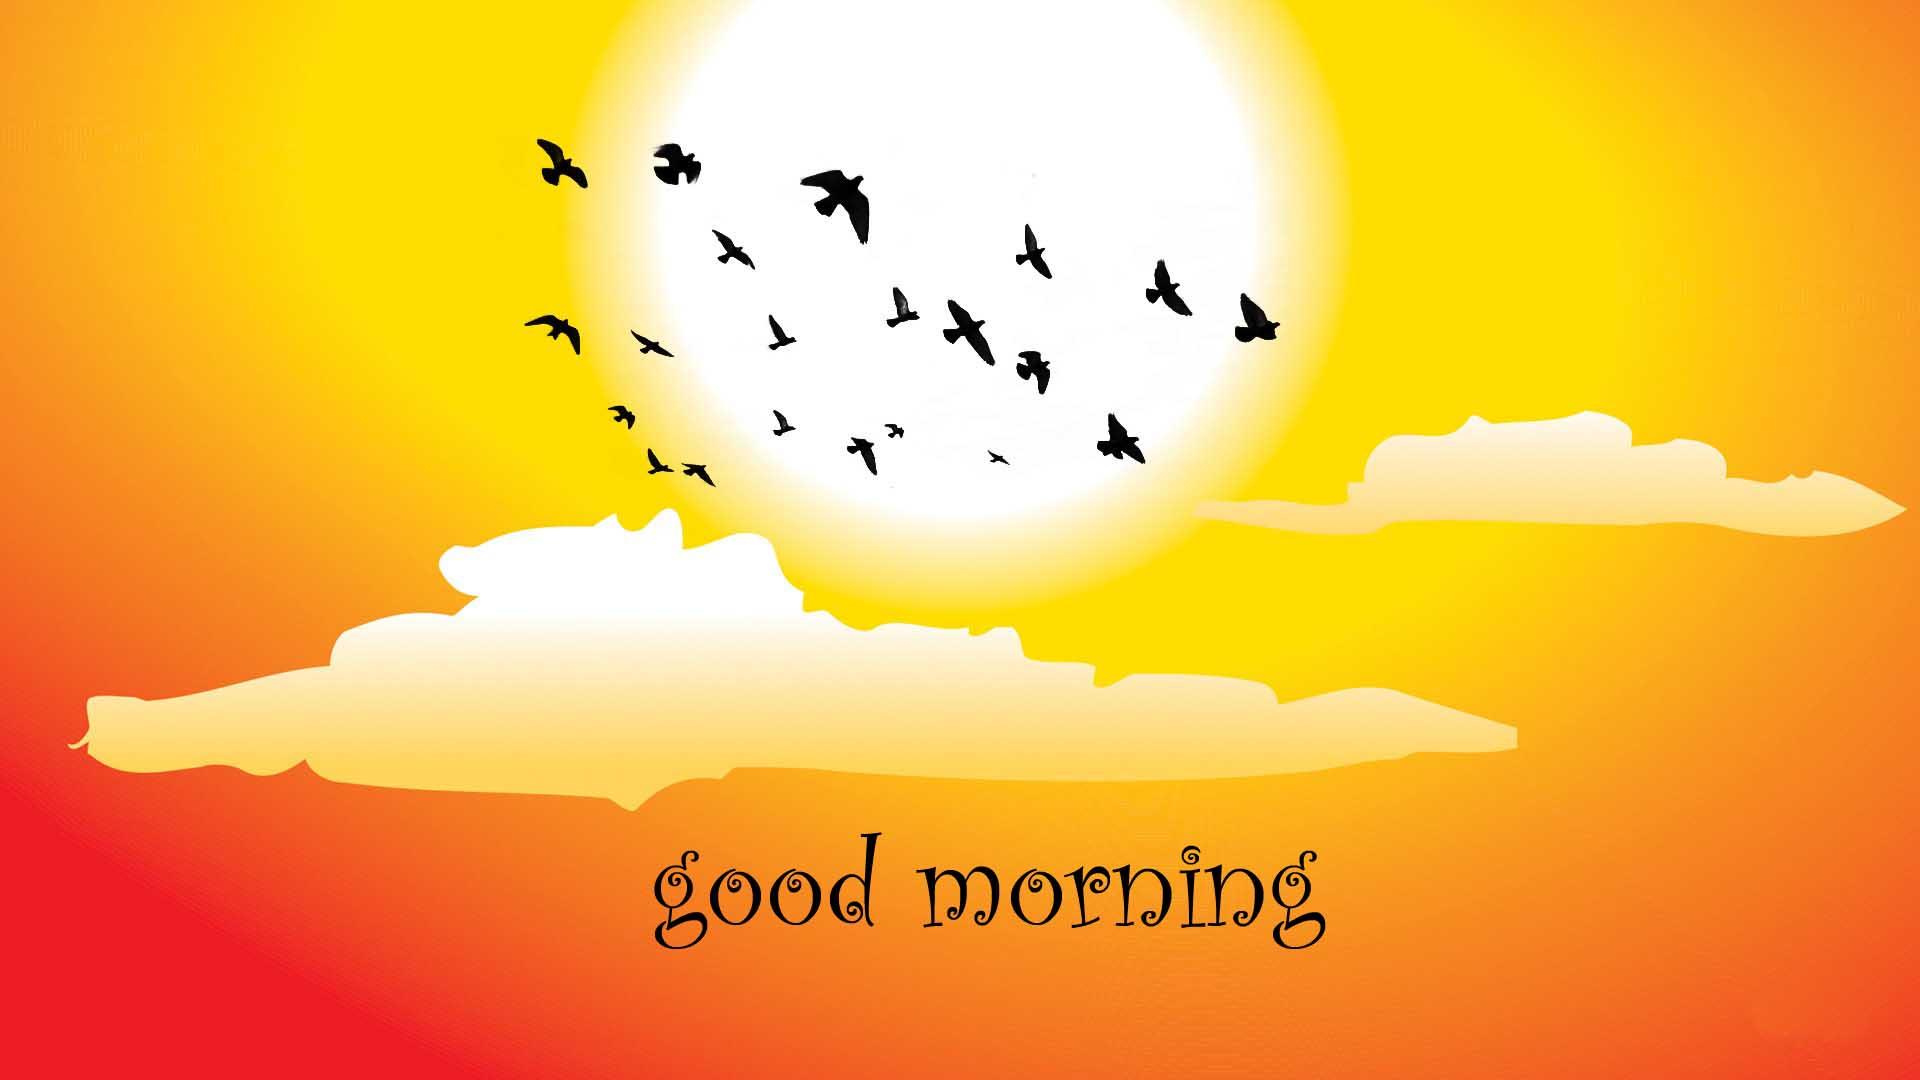 Good Morning Sun Quotes. QuotesGram